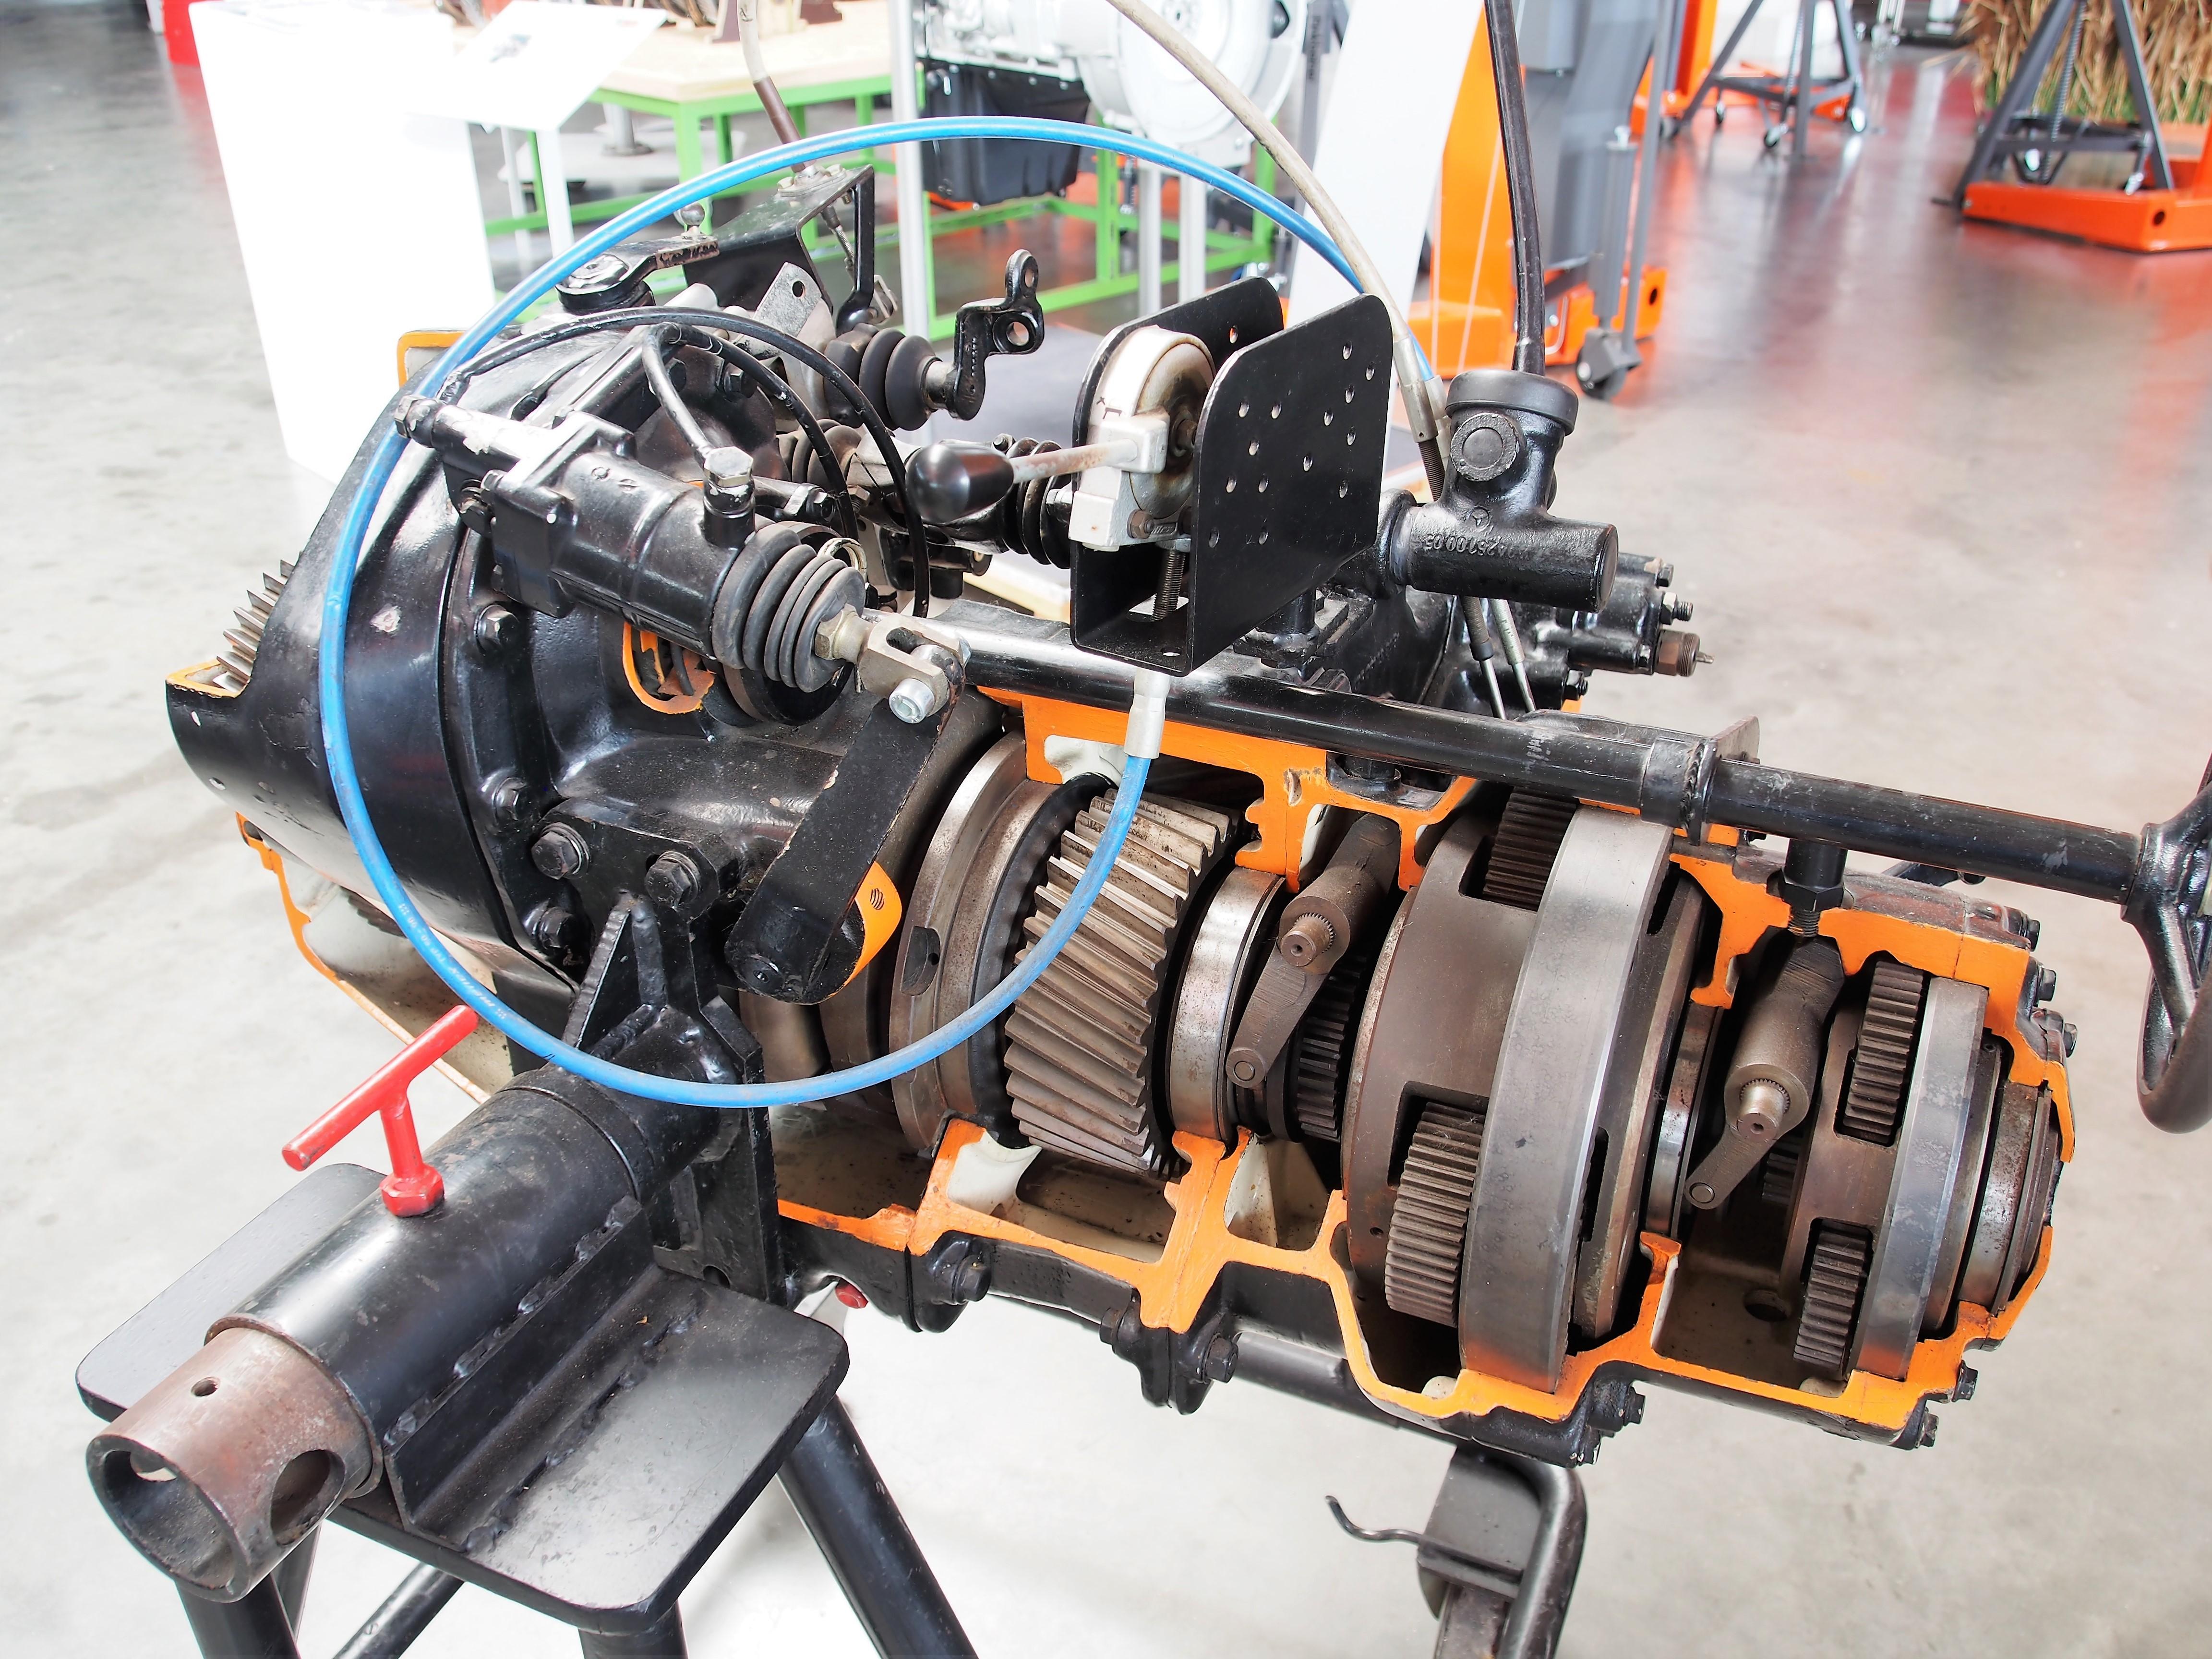 File:Unimog Getriebe, Unimoc Museum Bild 6.JPG - Wikimedia Commons